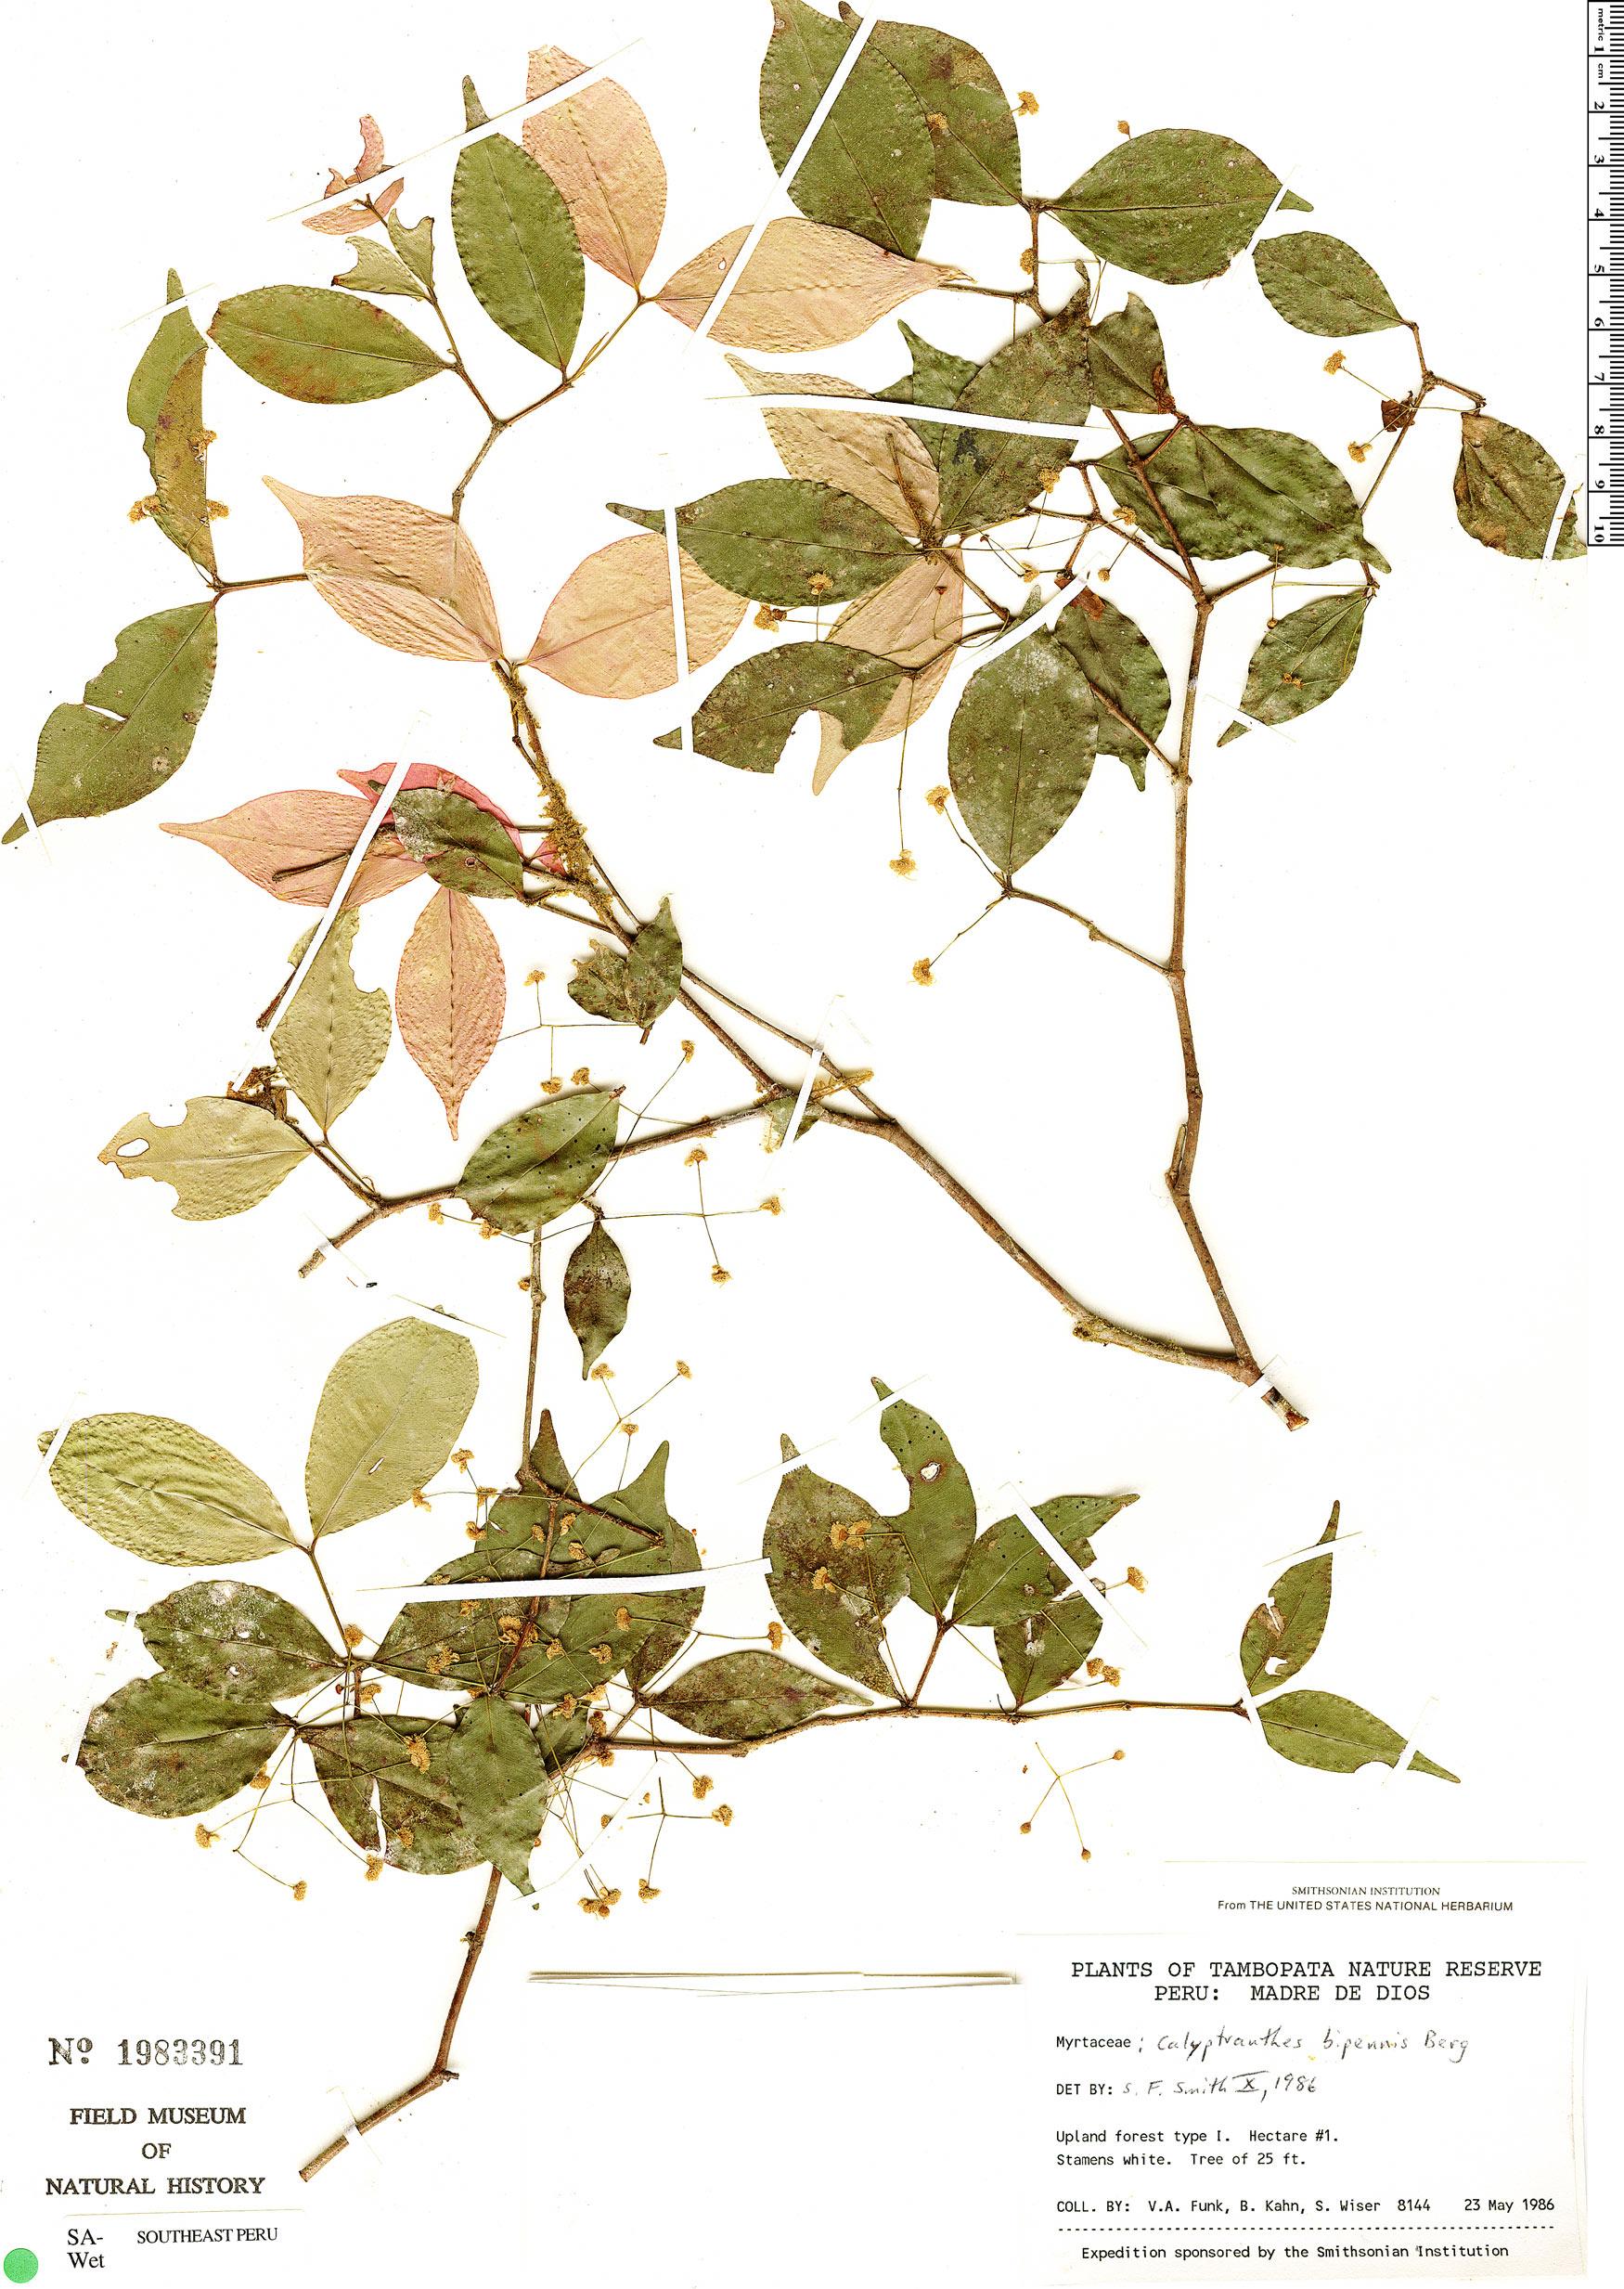 Specimen: Calyptranthes bipennis